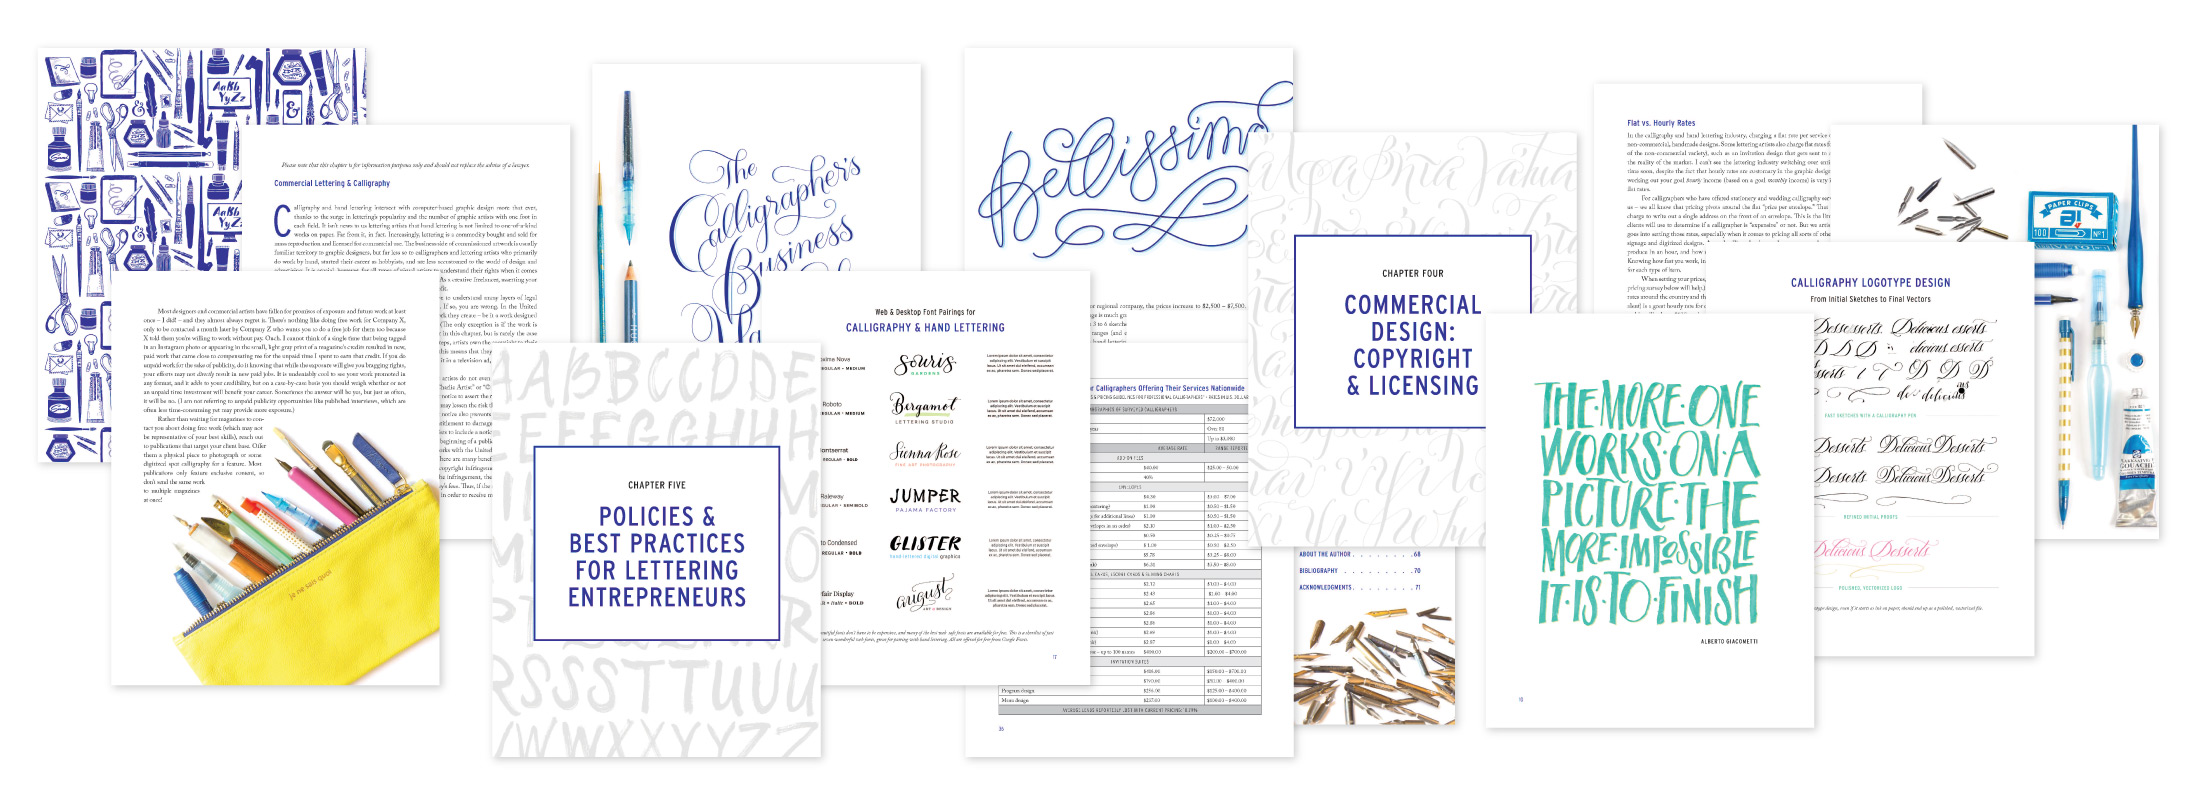 Calligrapher's Business Handbook - Molly Suber Thorpe